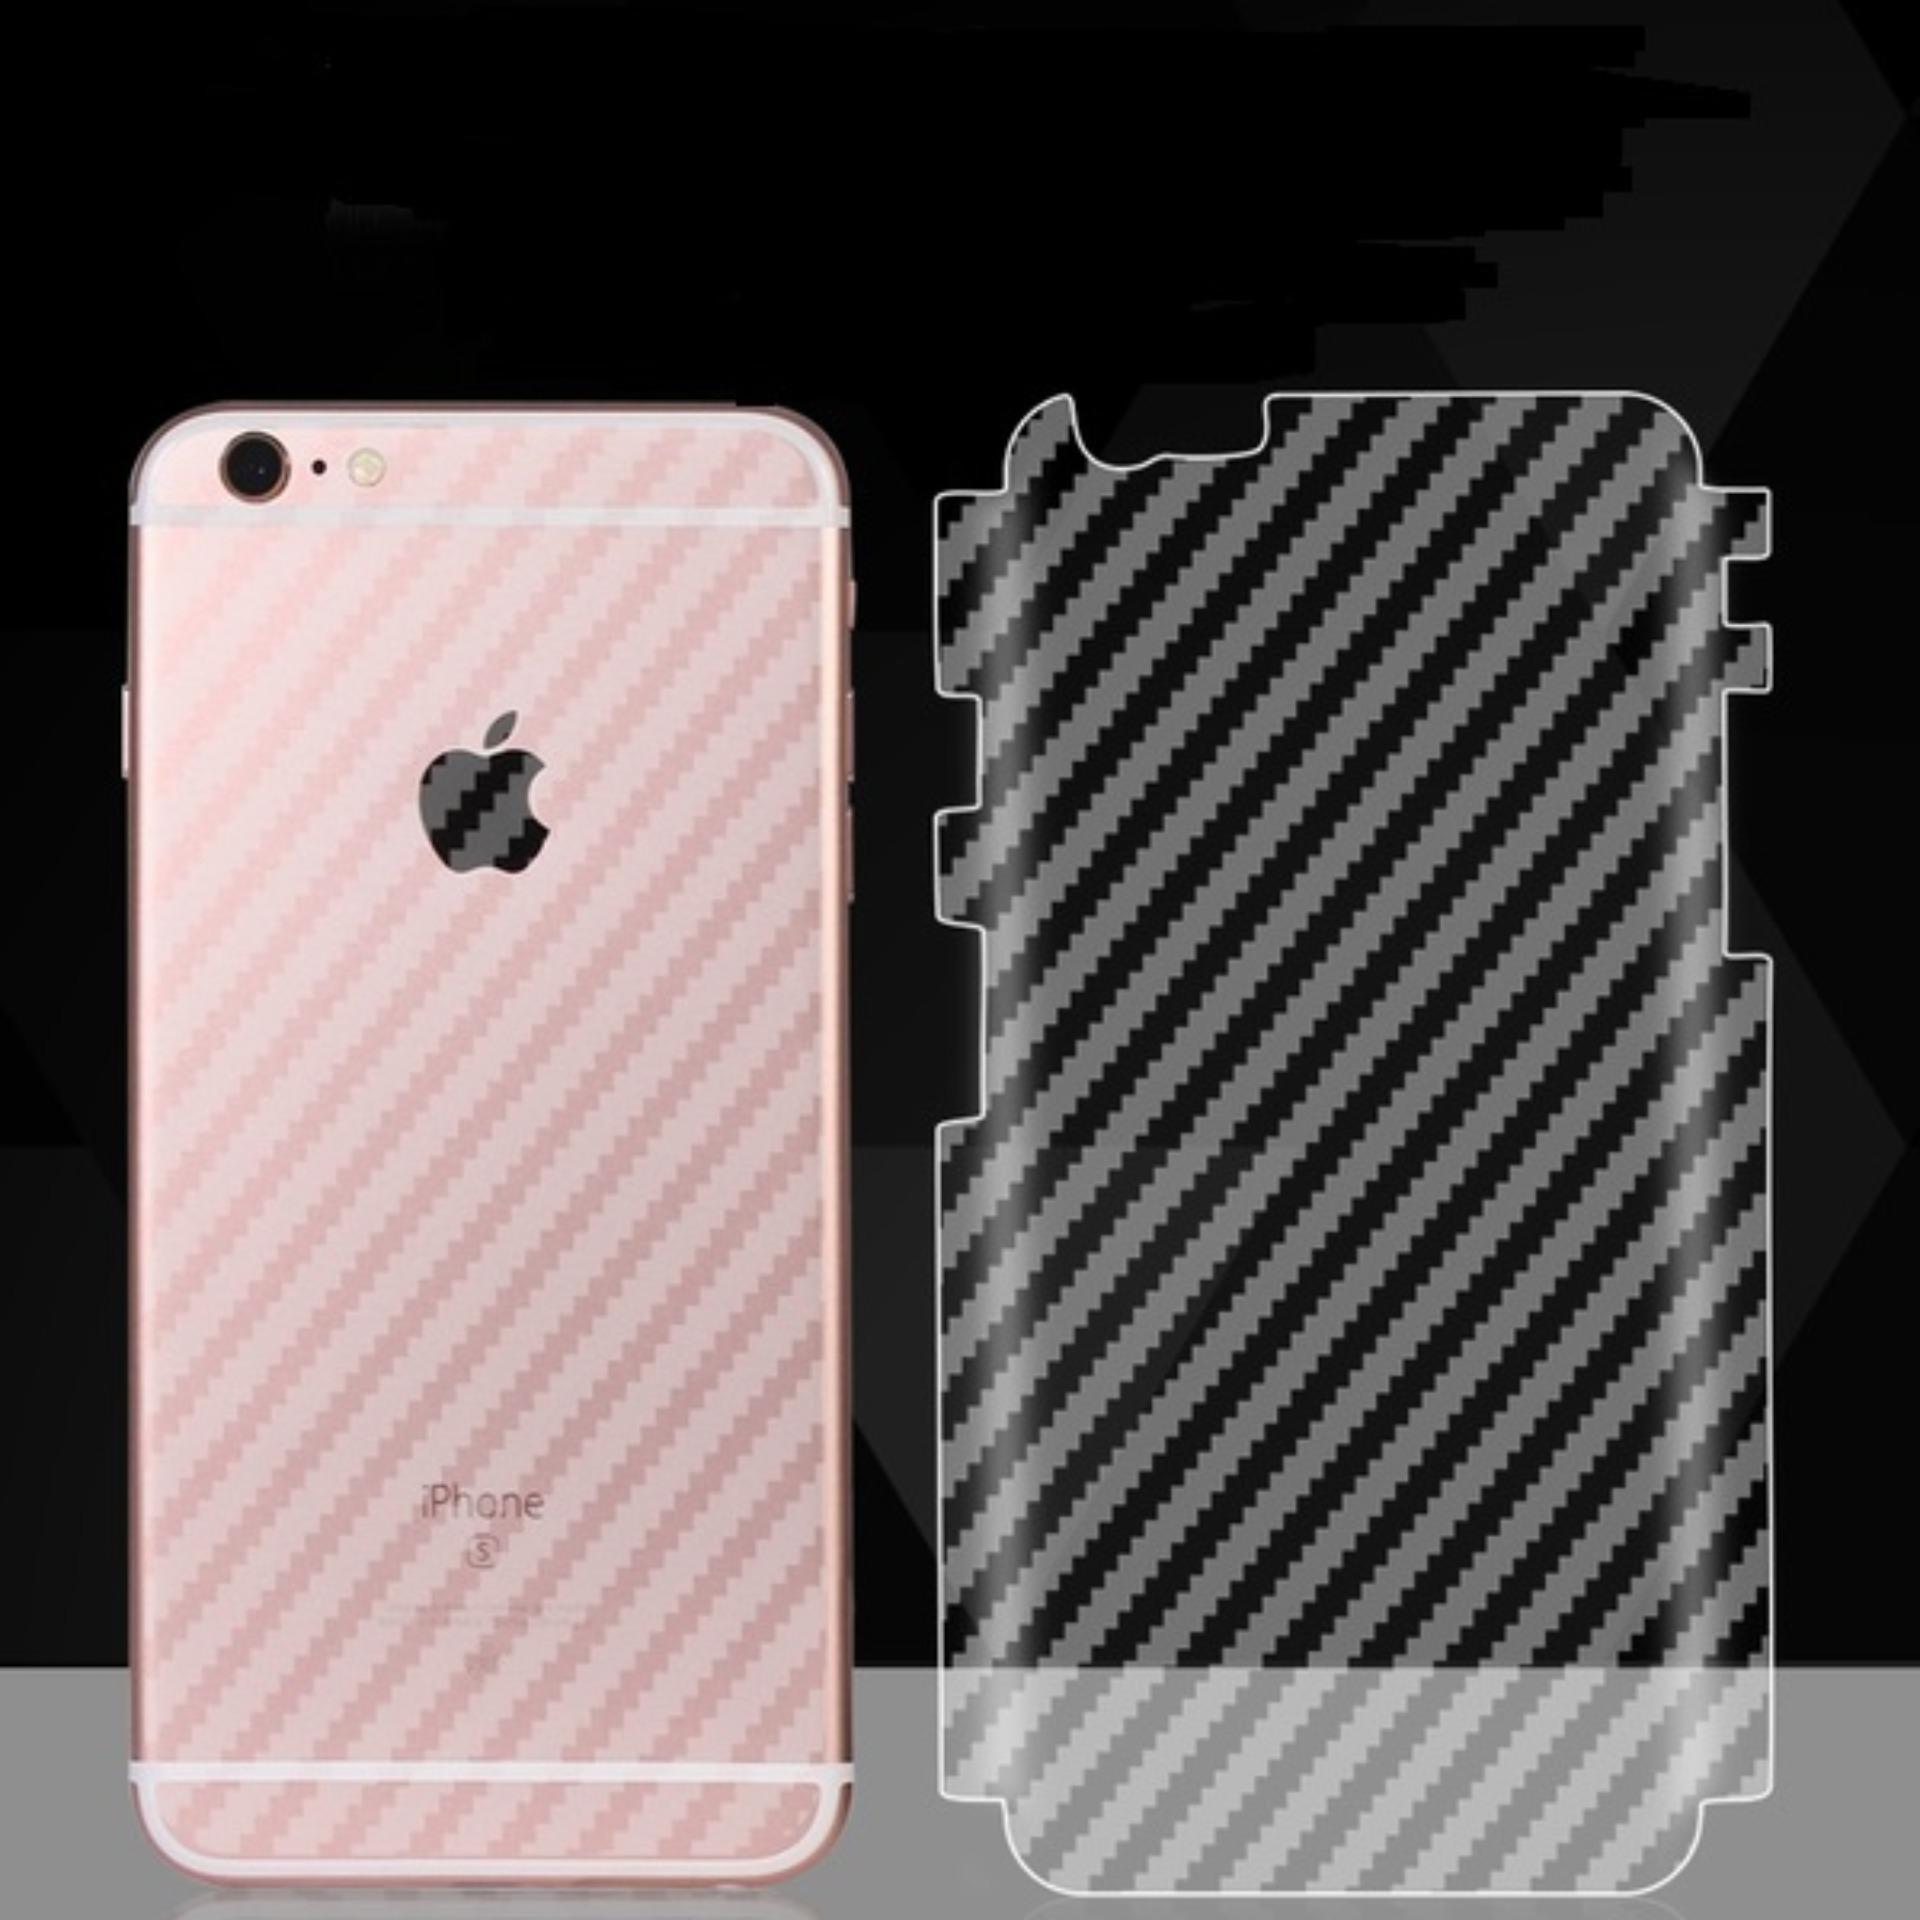 Miếng dán mặt sau vân Carbon cho Iphone 6 Plus/6S Plus - Trong suốt